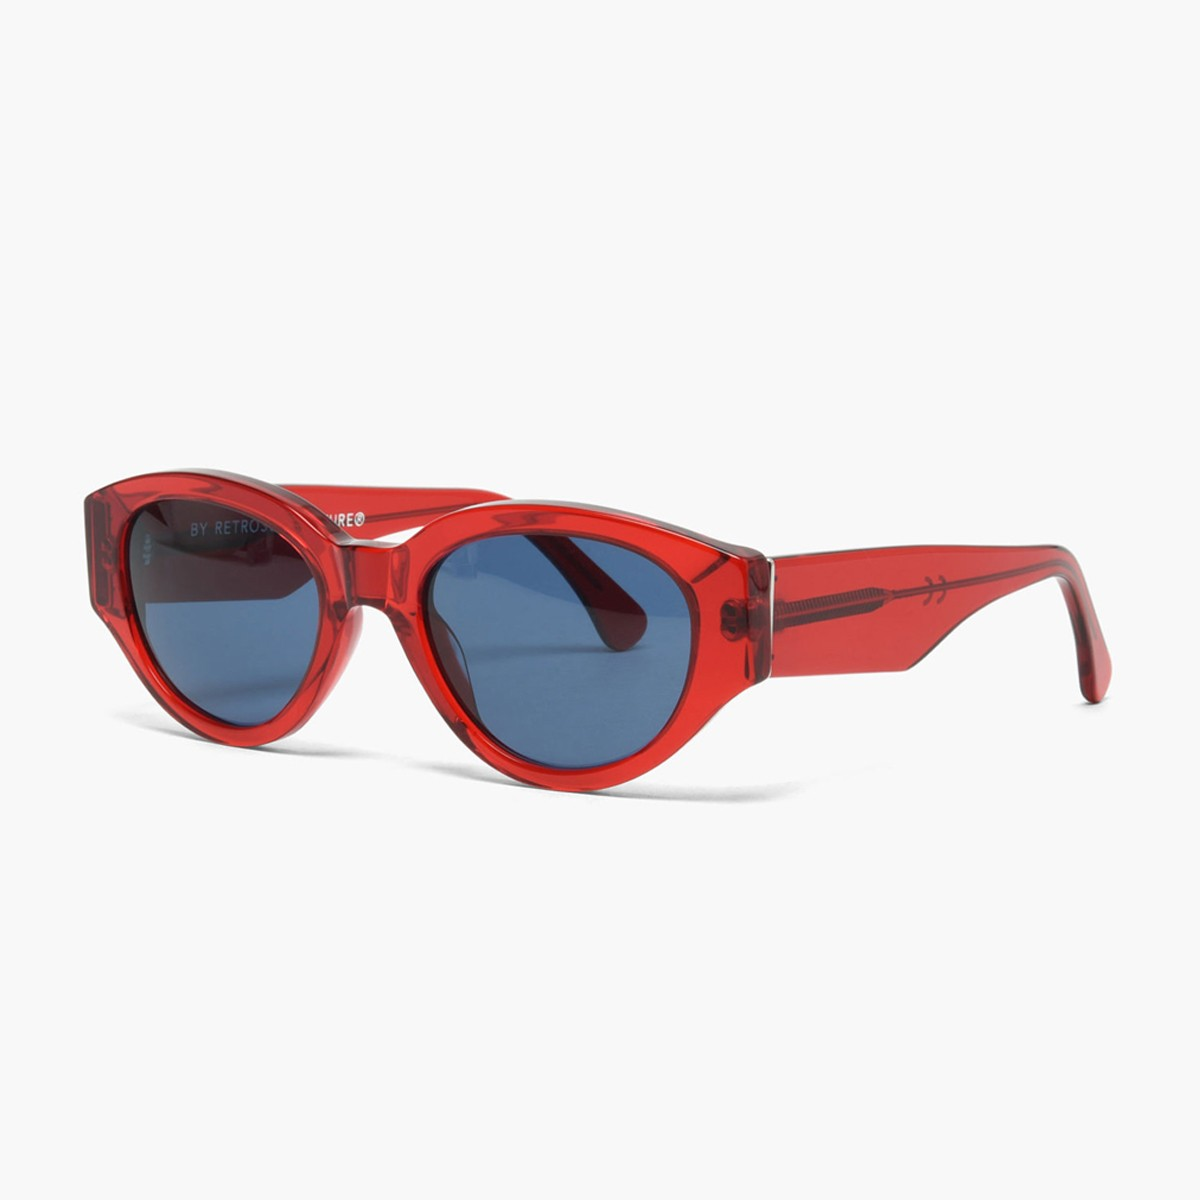 Super Drew | Women's sunglasses